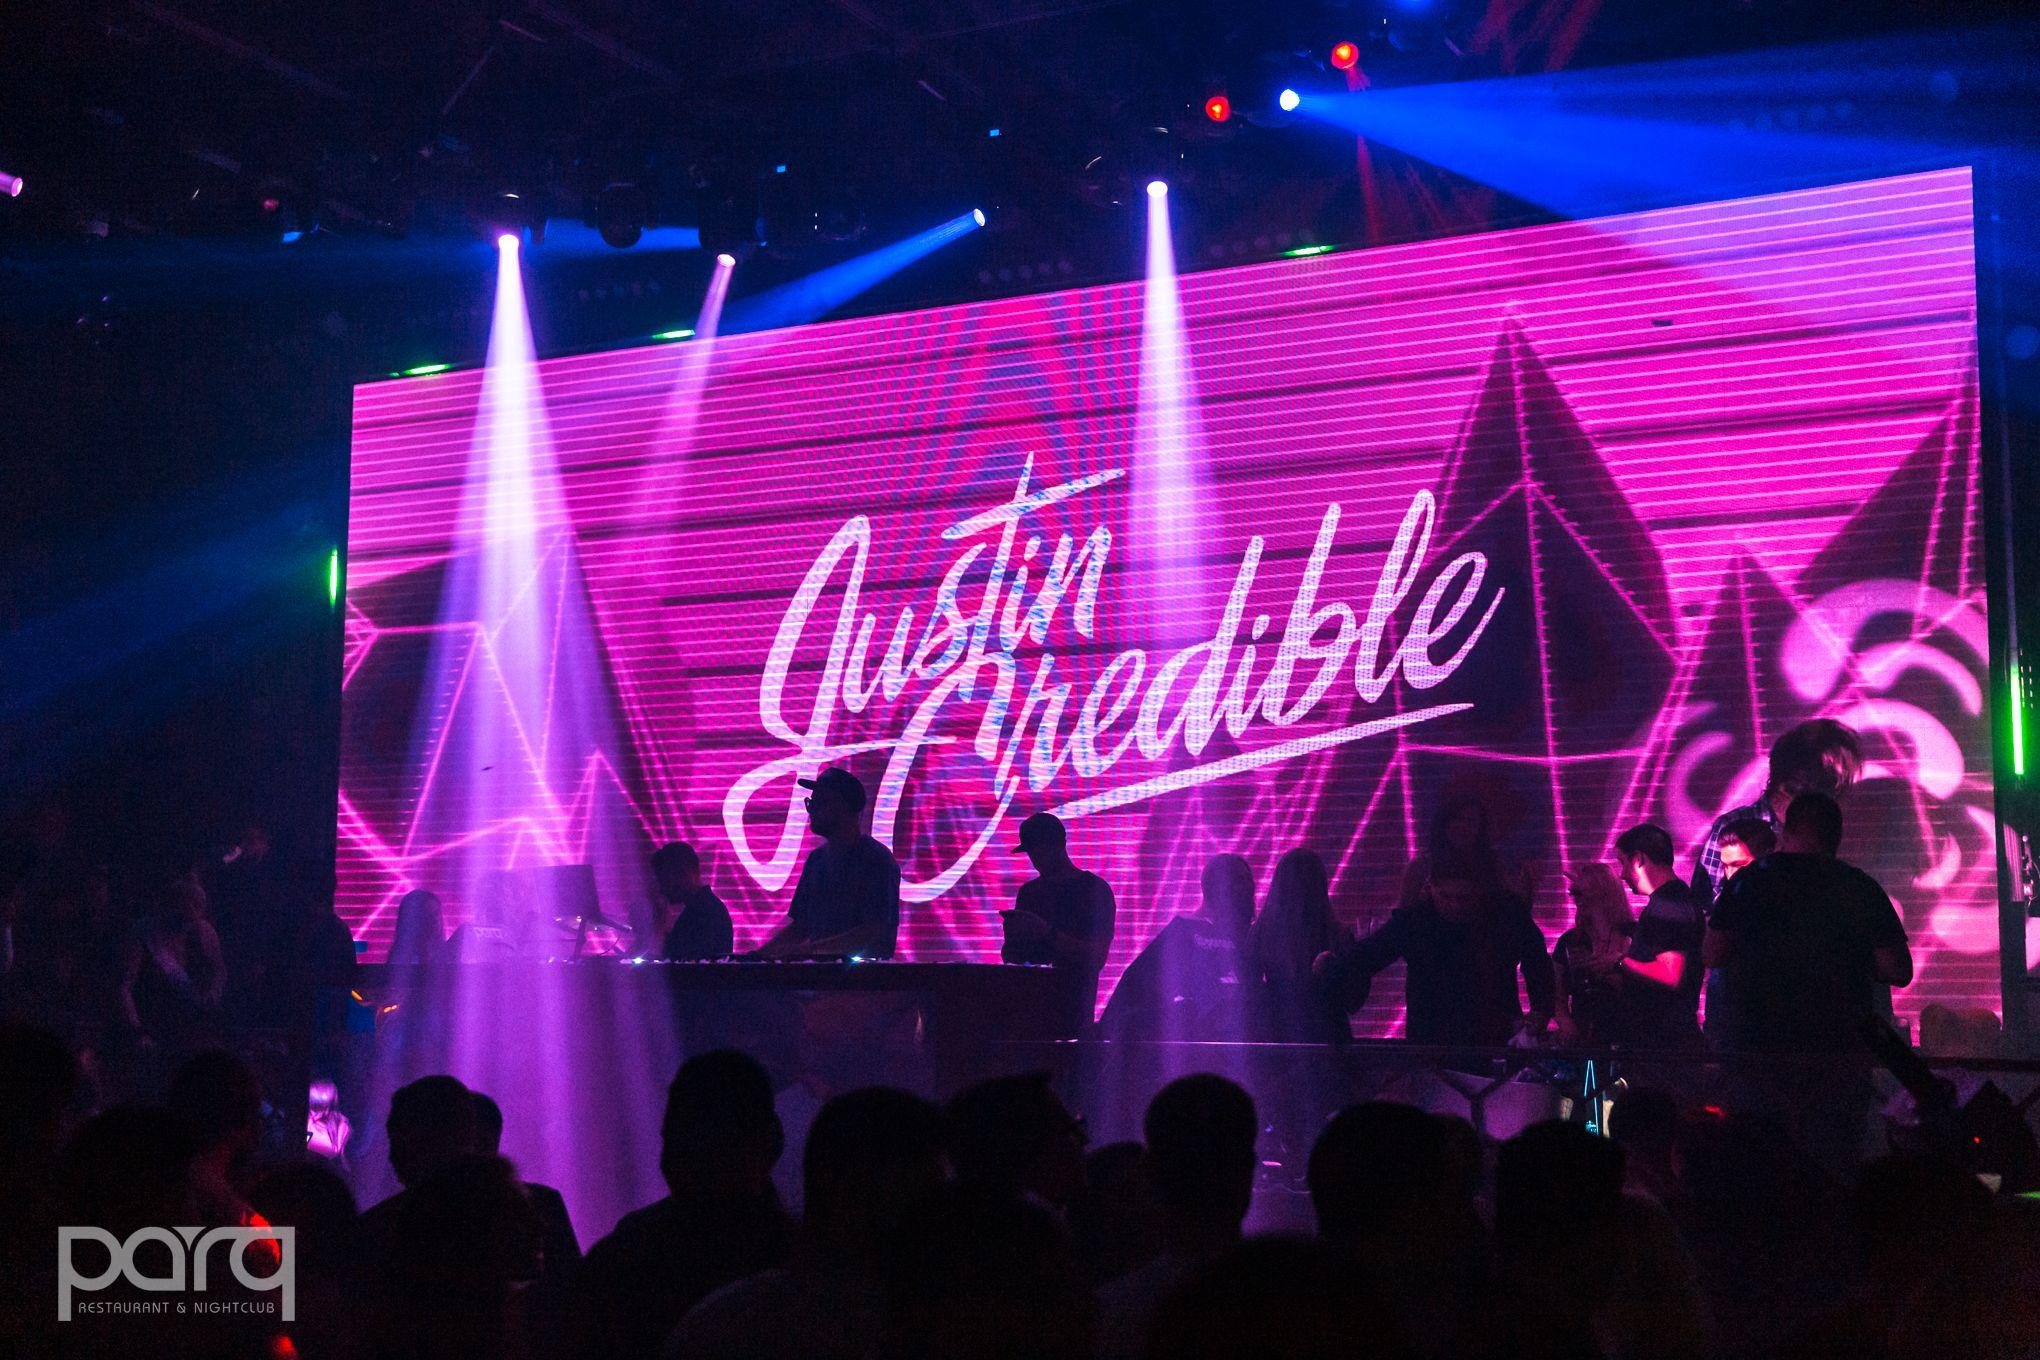 04.12.19 Parq - Justin Credible-1.jpg